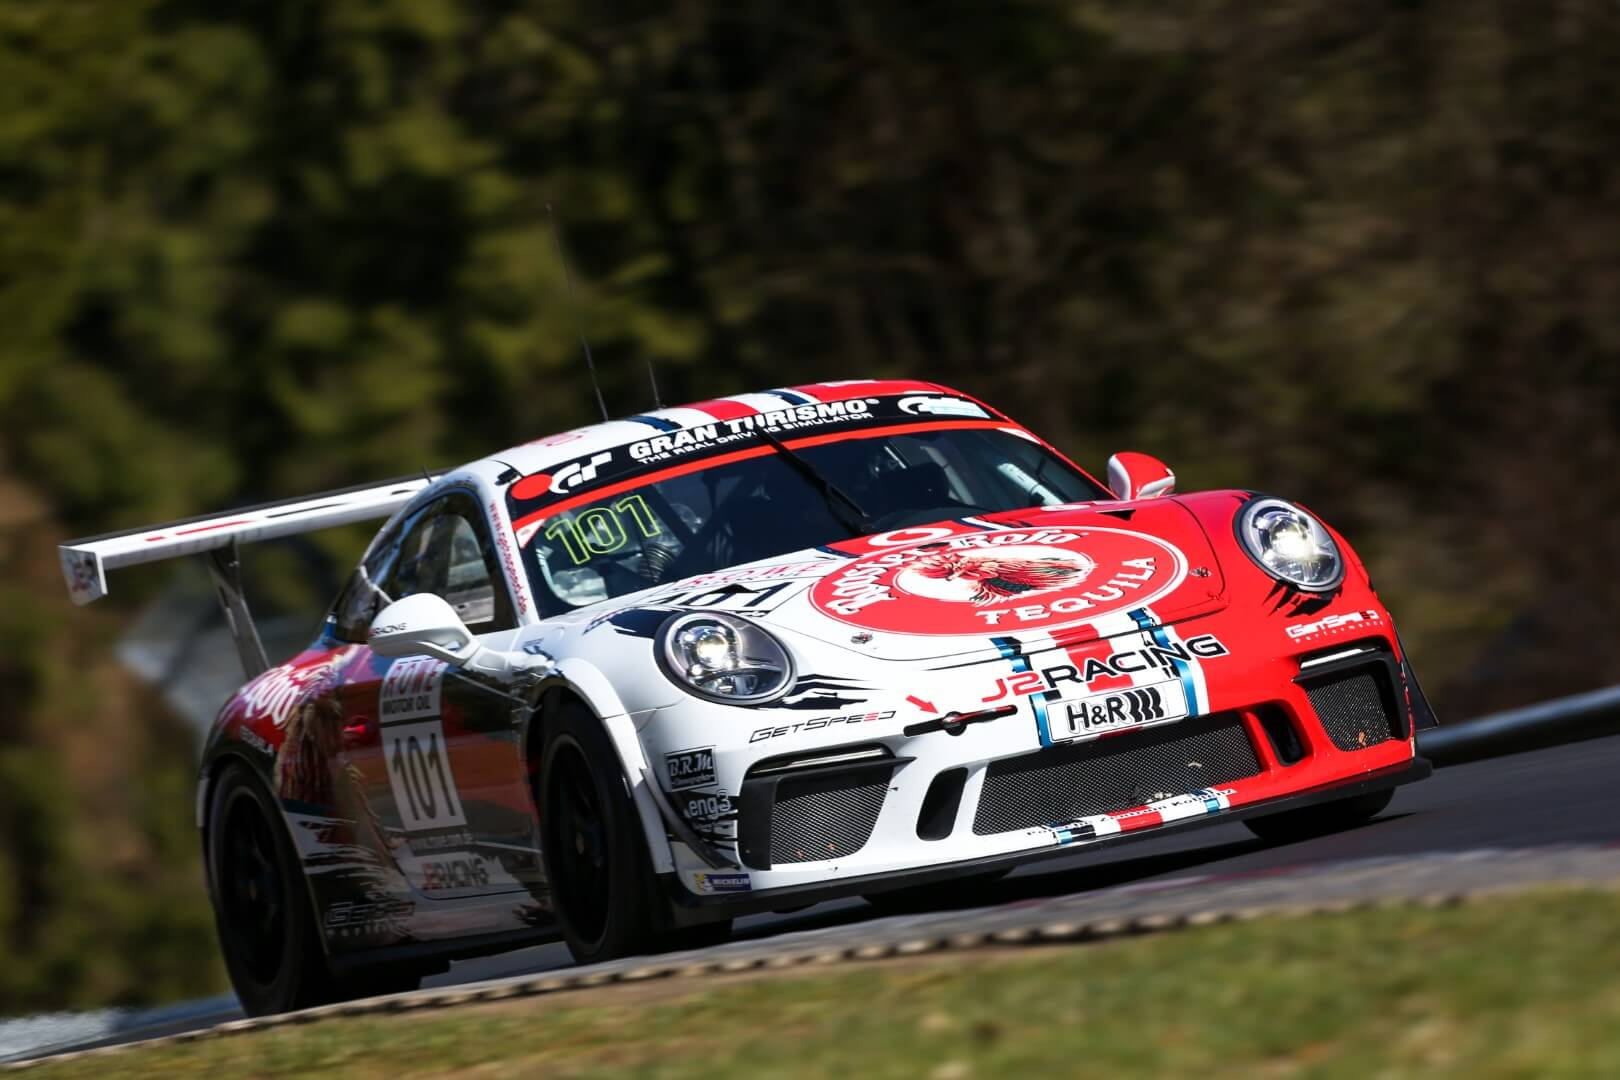 VLN 1. Lauf 2018, Nürburgring-Nordschleife - Foto: Gruppe C Photography; #101 Porsche 911 GT3 Cup, GIGASPEED Team GetSpeed Performance: John Shoffner, Janine Hill, Arno Klasen